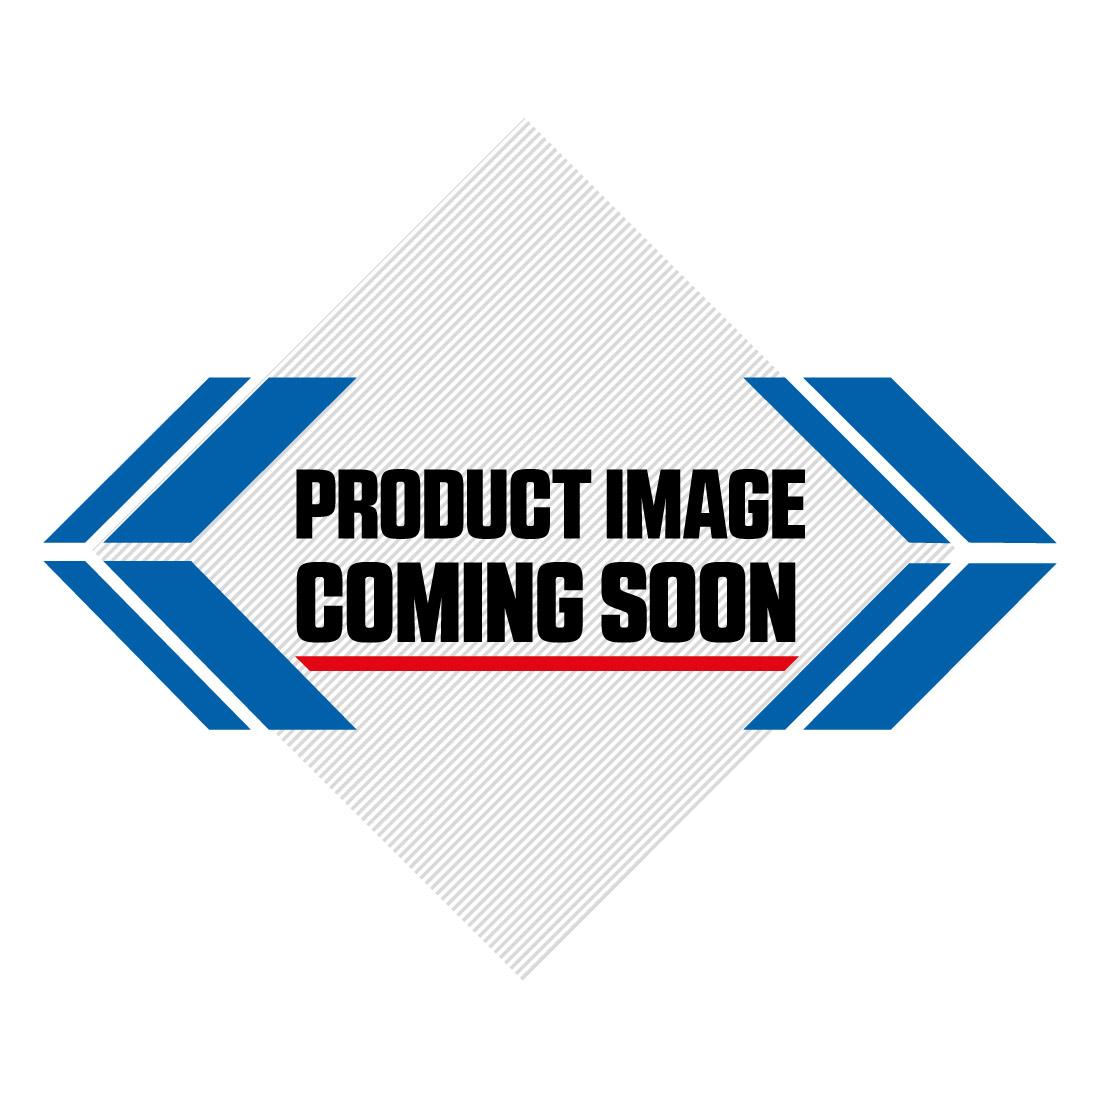 Suzuki Plastic Kit RMZ 450 (2013) OEM Factory Image-4